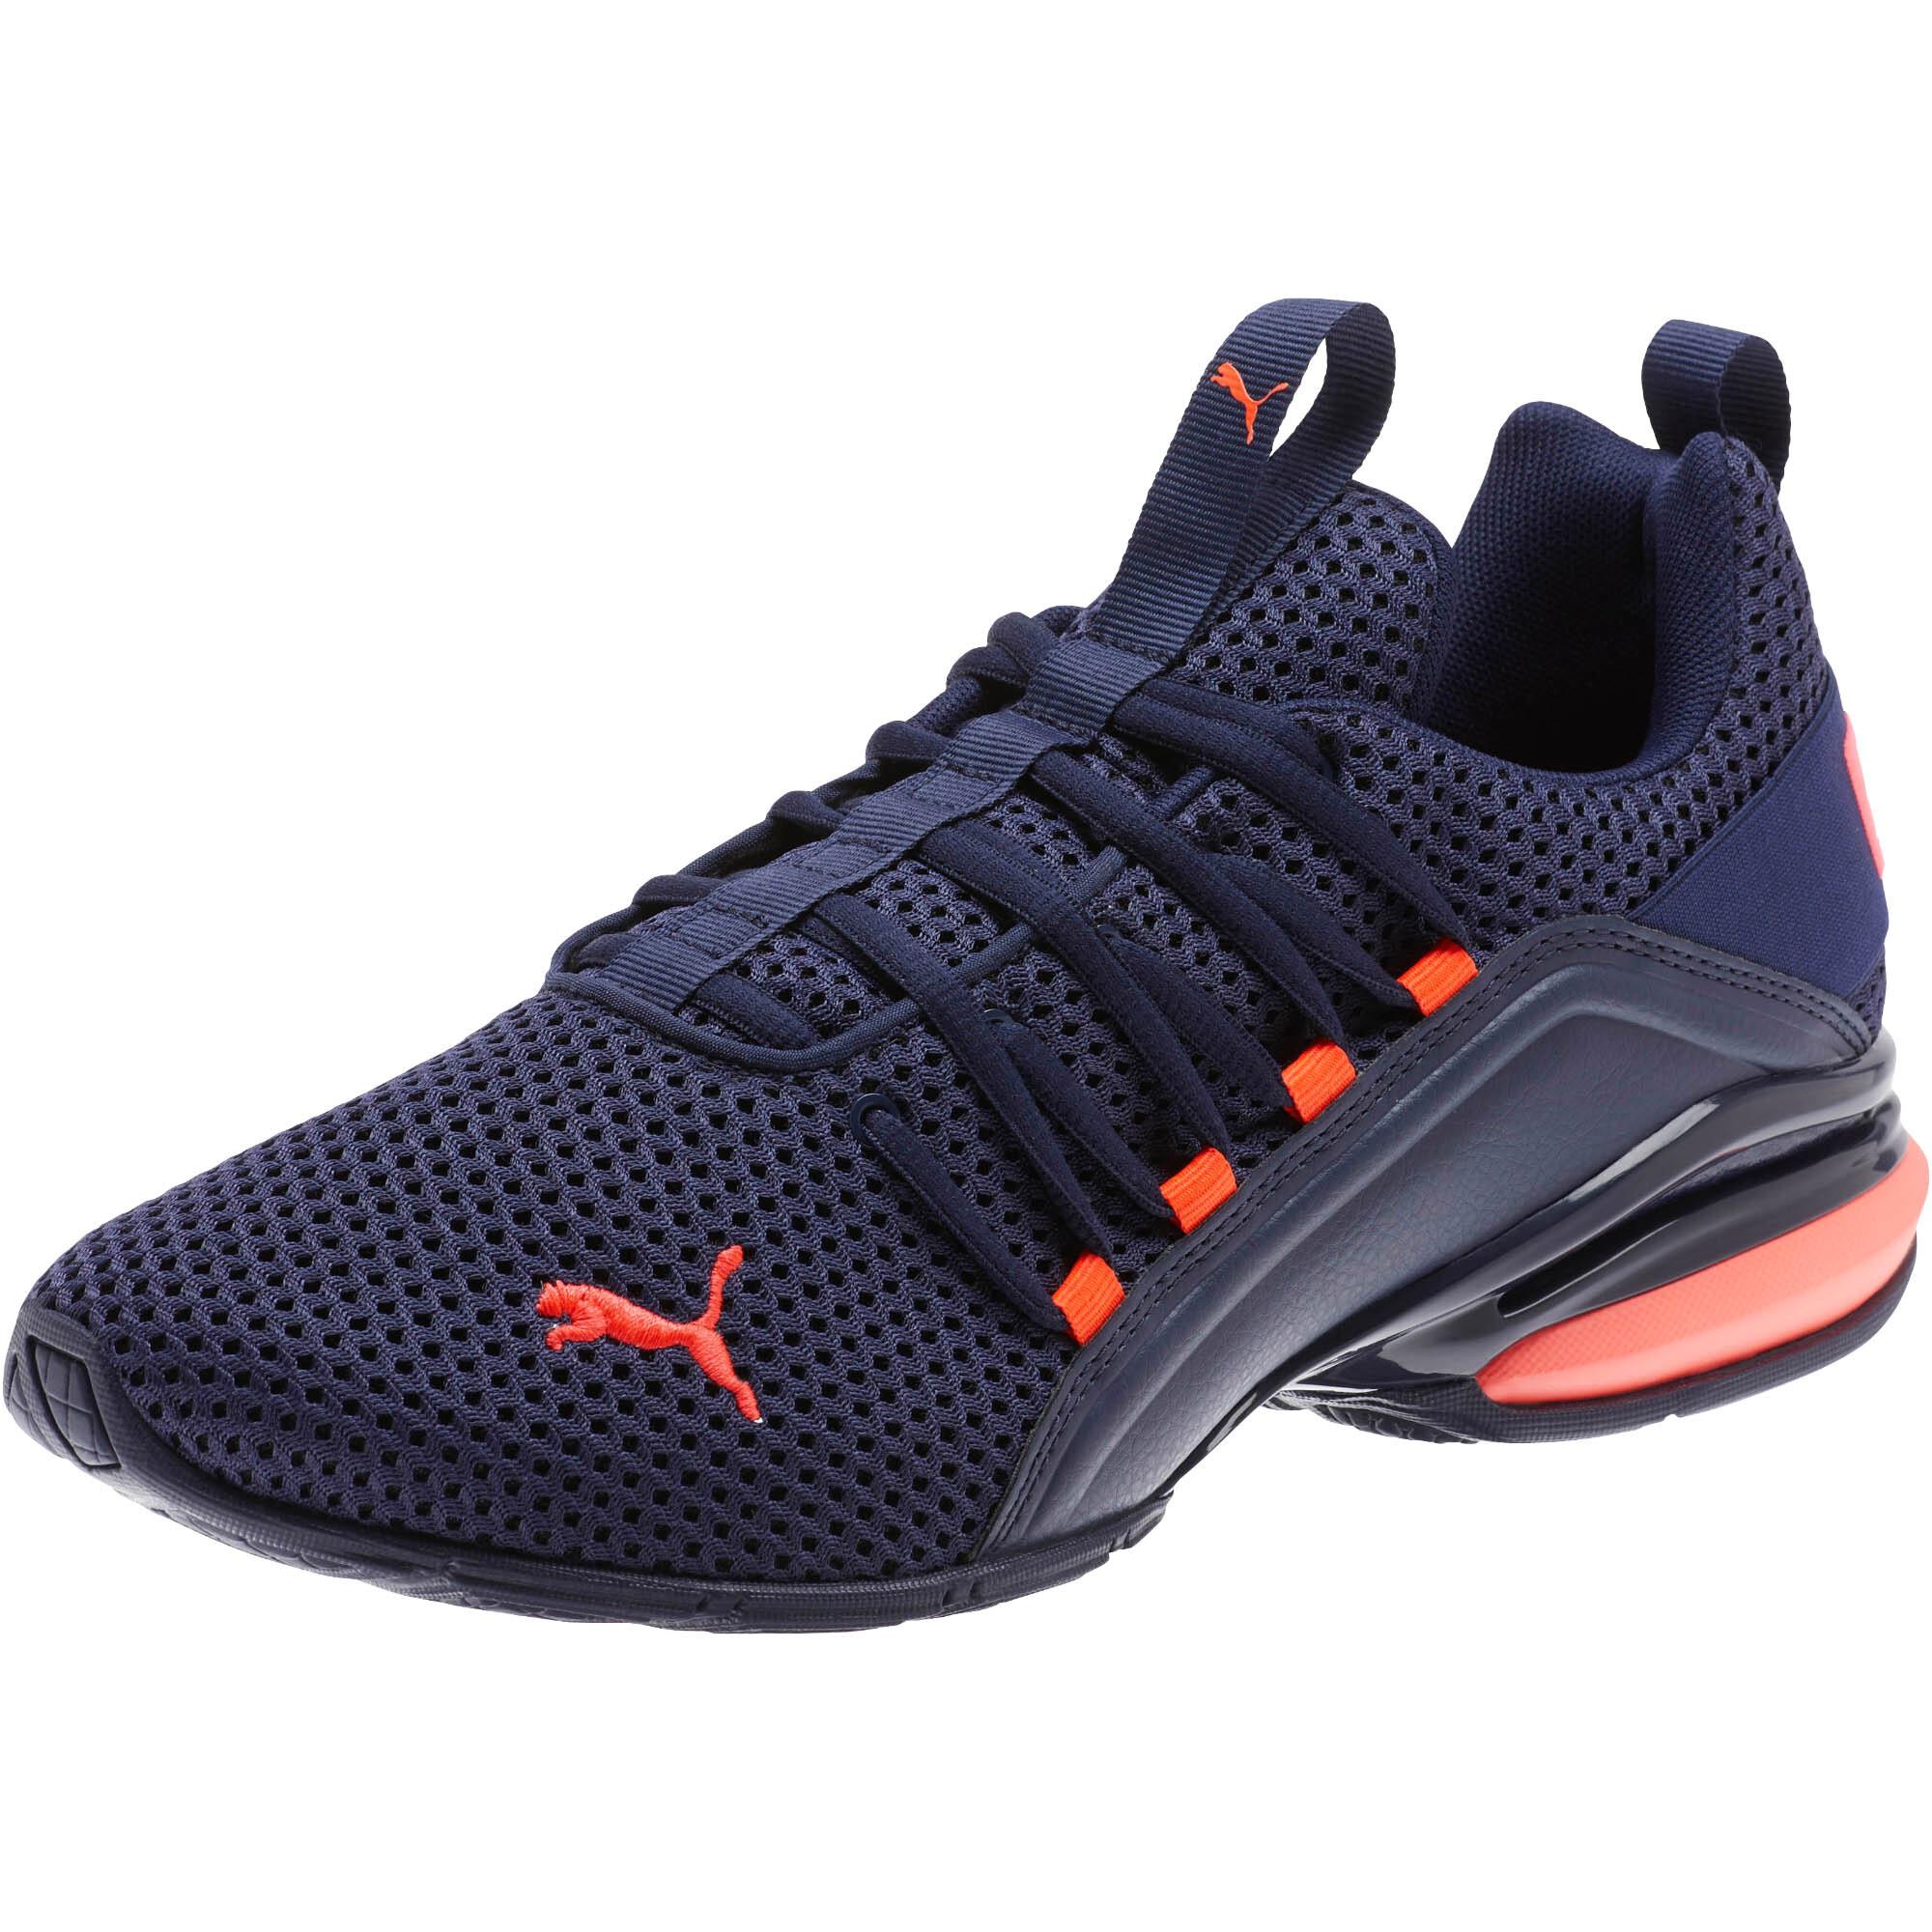 PUMA-Axelion-Breathe-Men-s-Training-Shoes-Men-Shoe-Running thumbnail 4